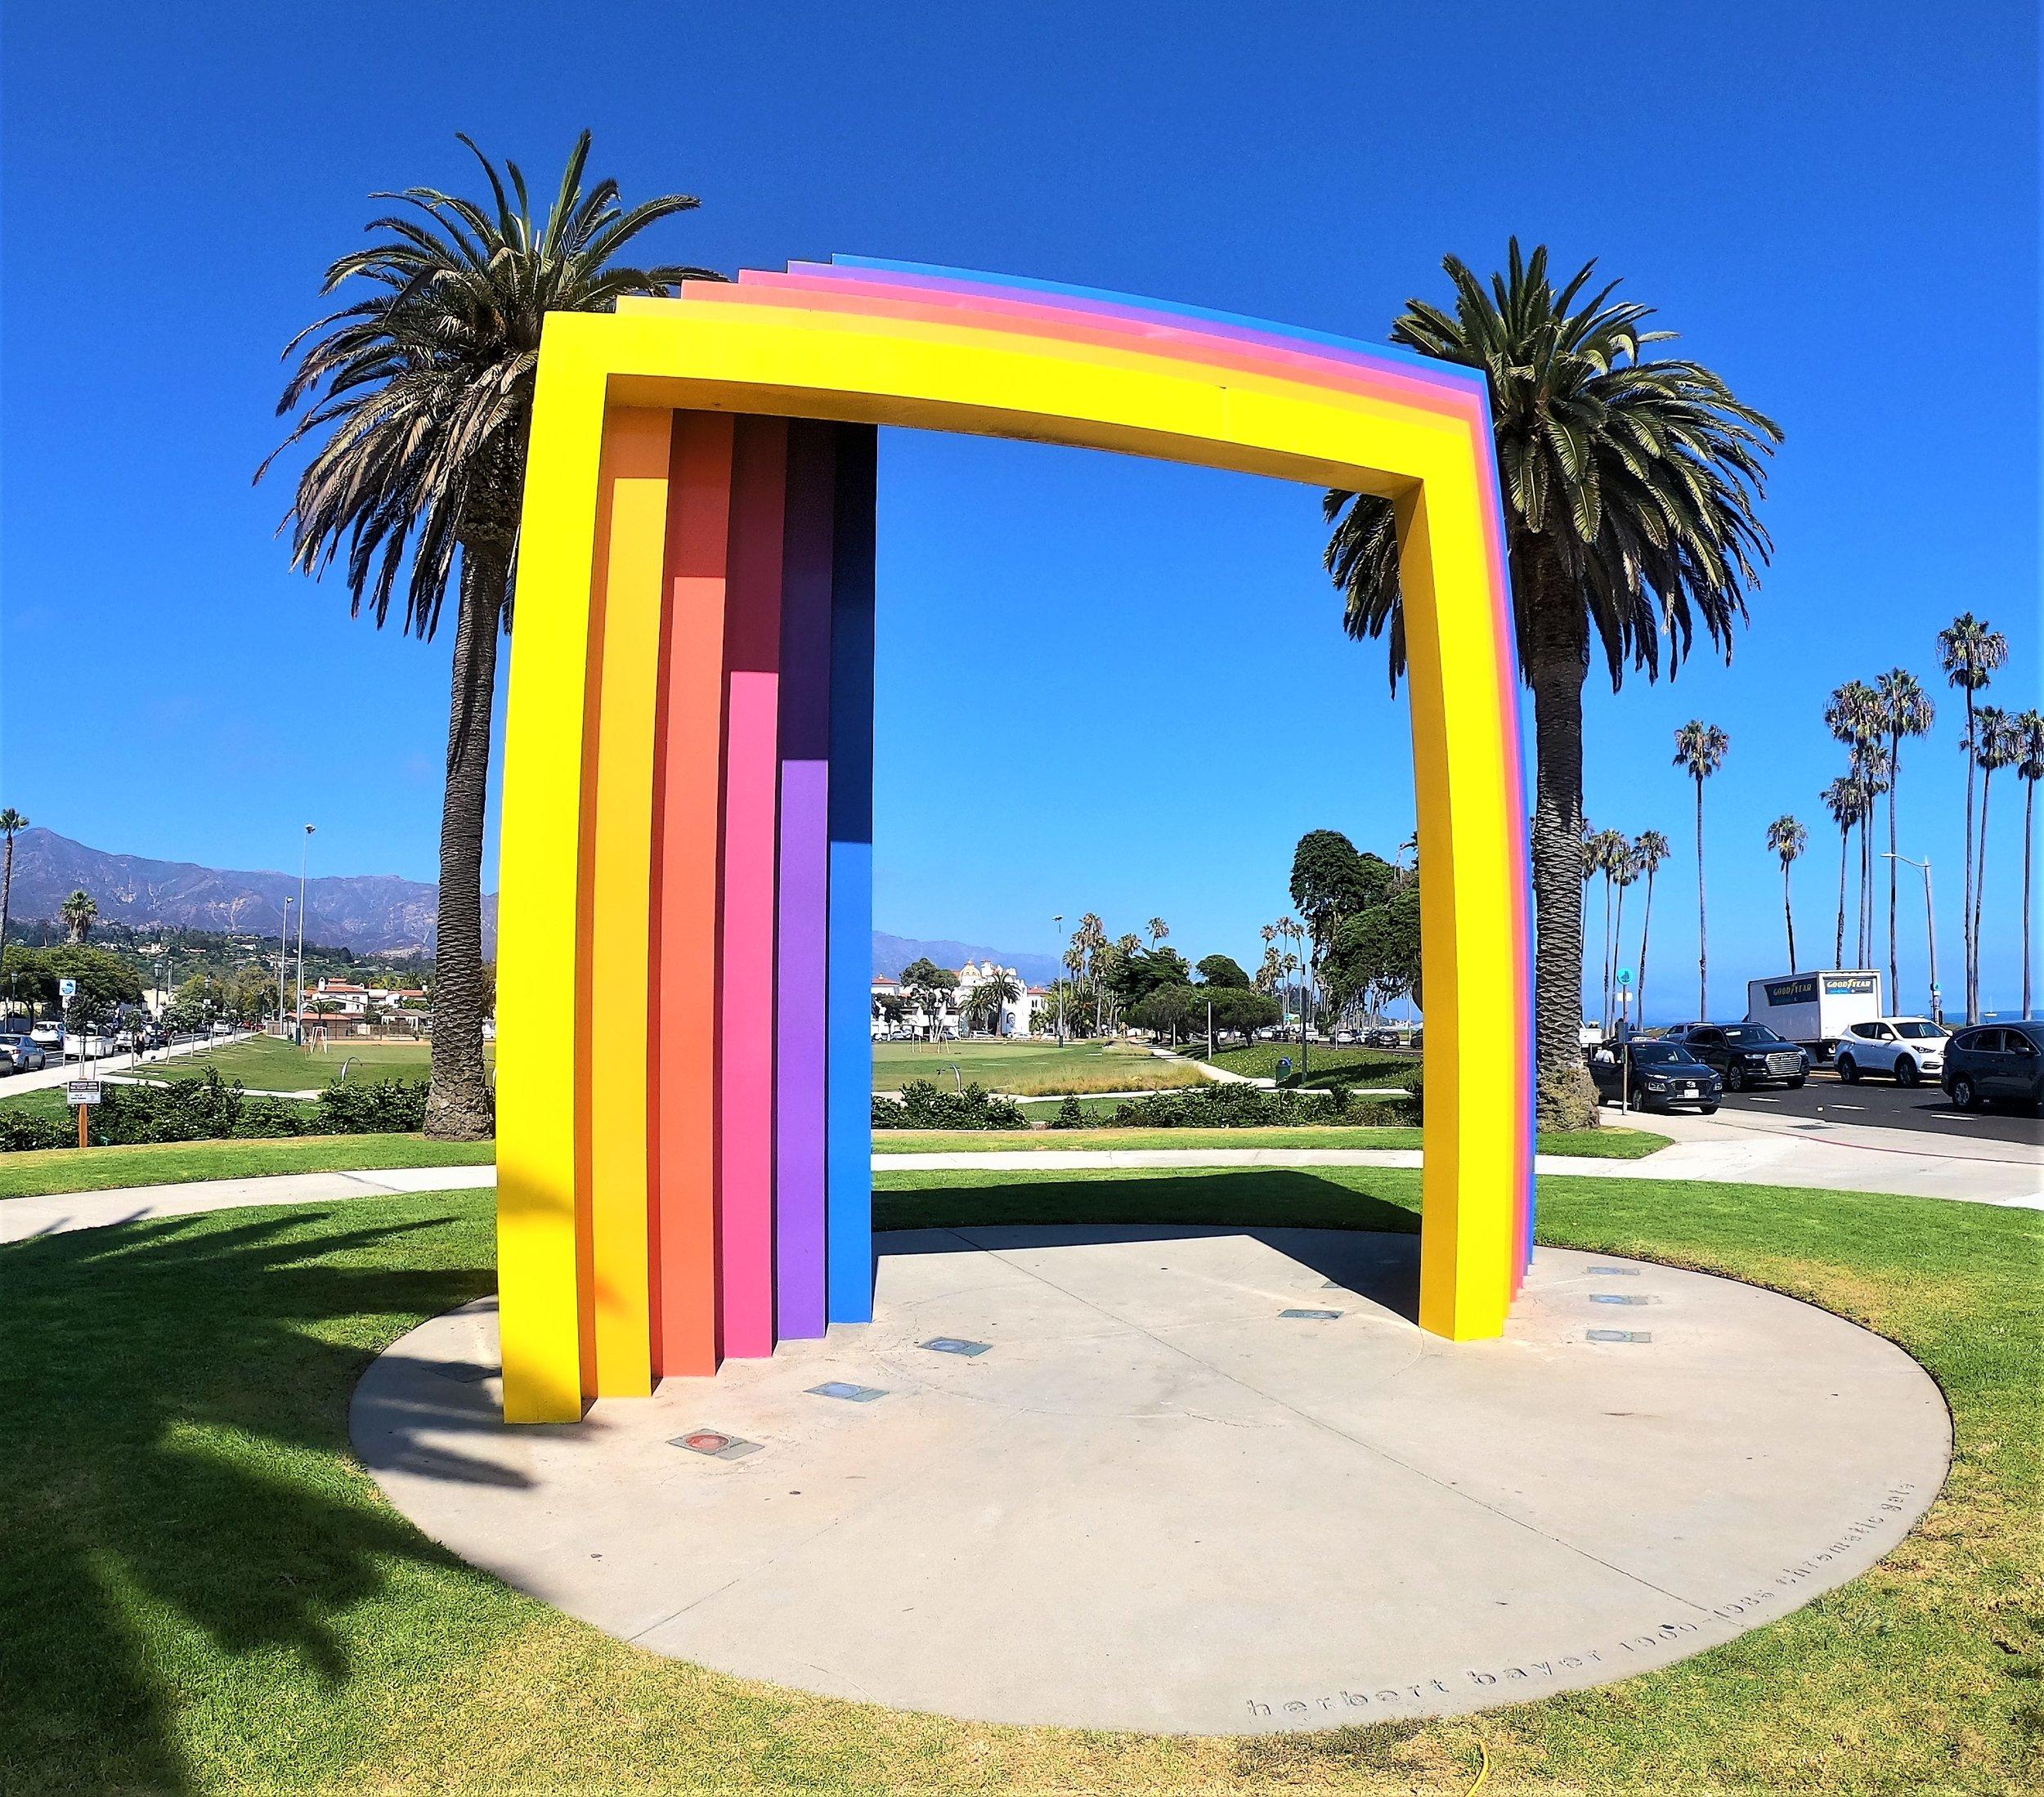 Santa Barbara Chromatic Gate by Herbert Bayer